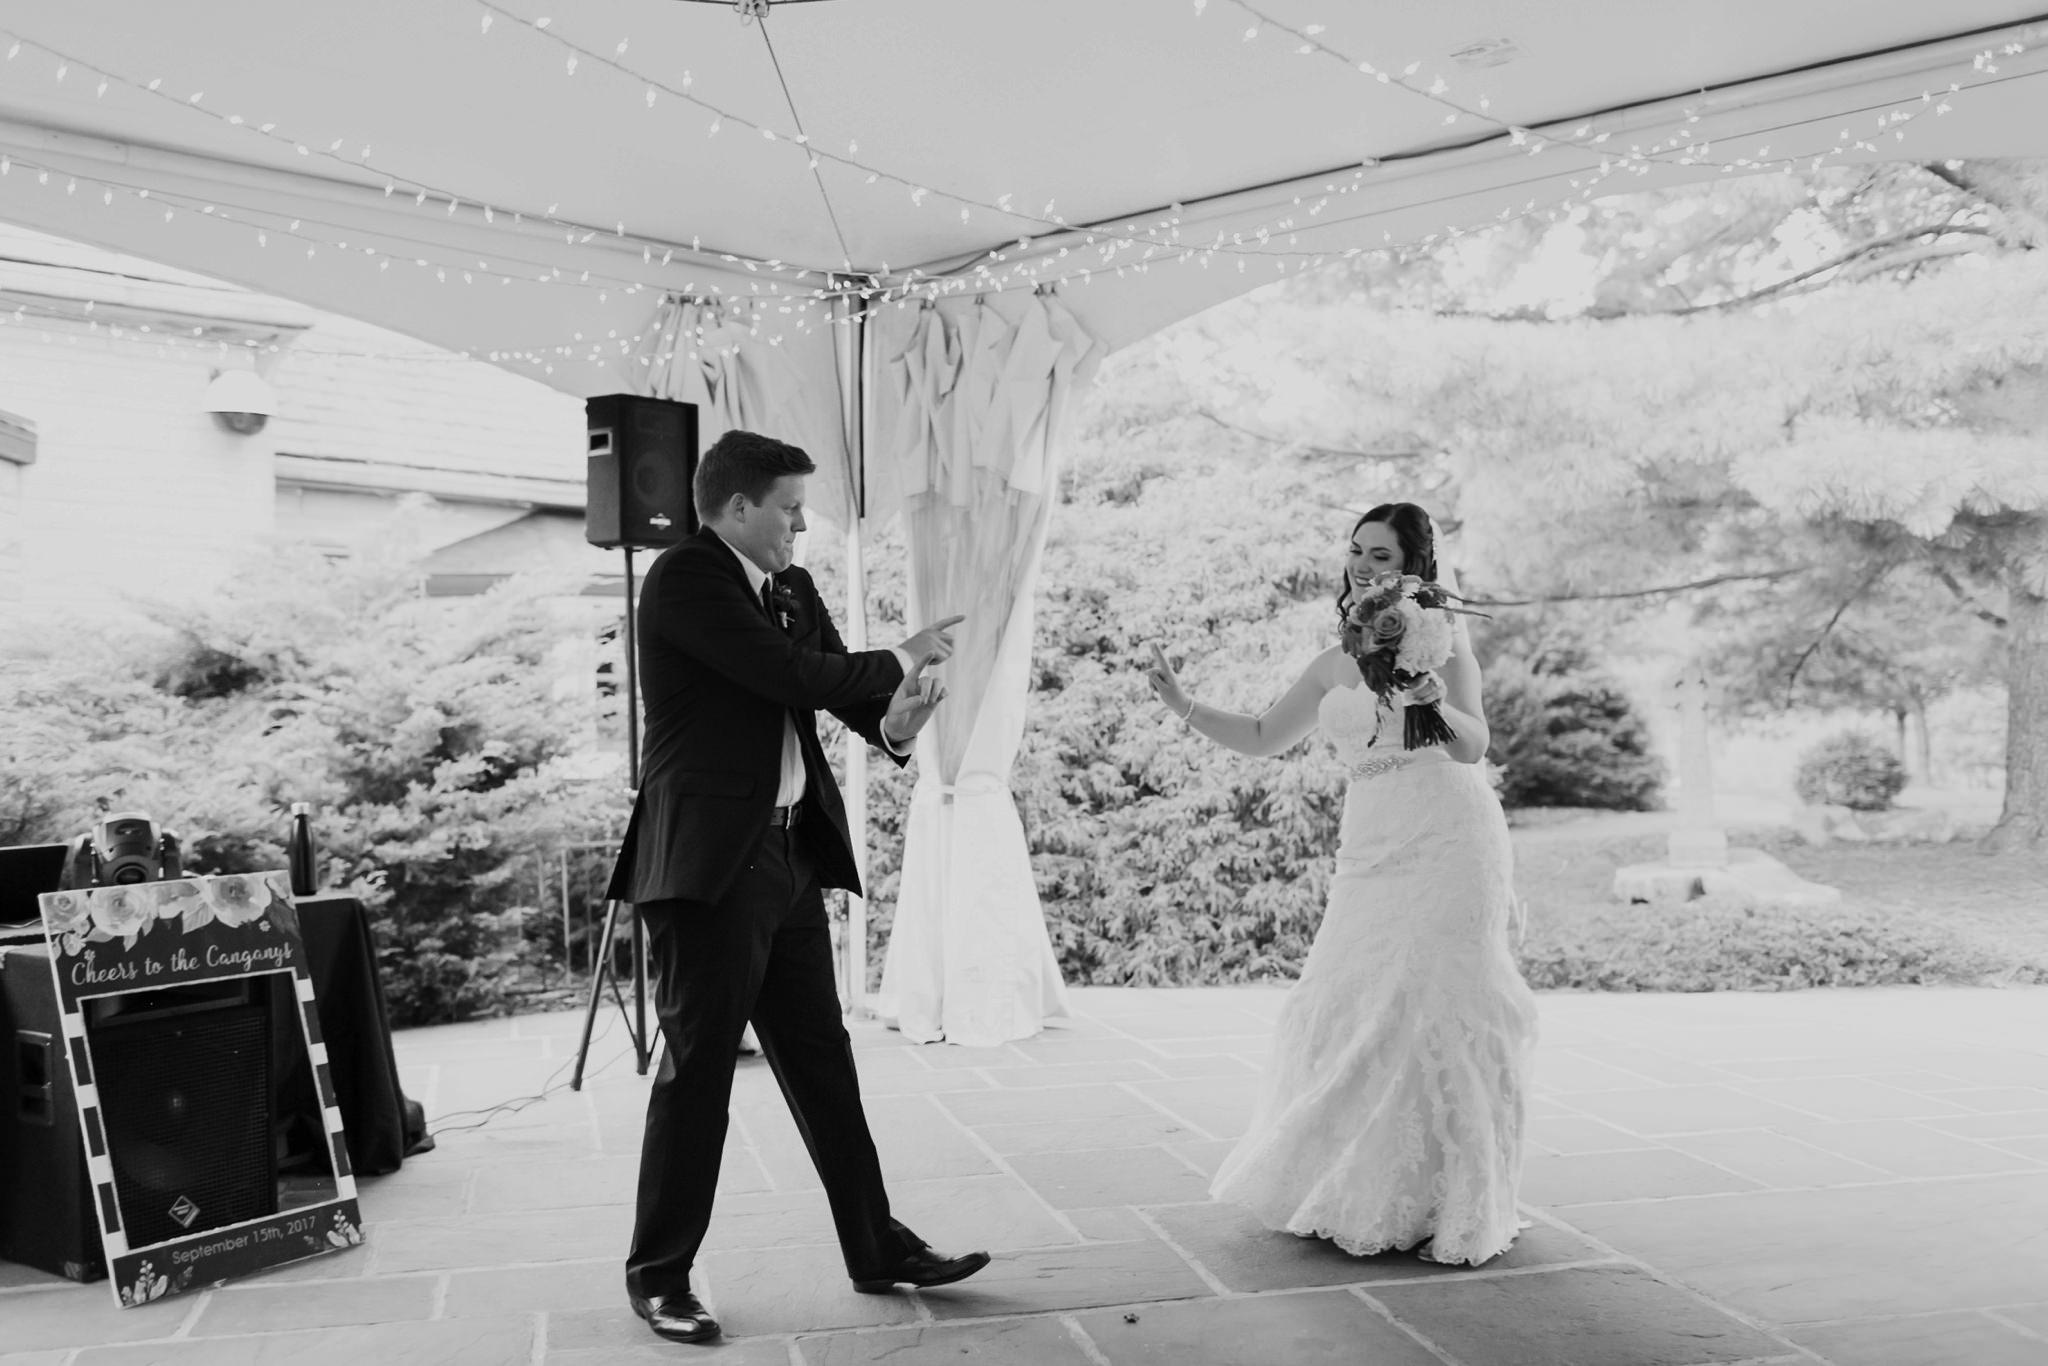 17-09-15 Lindsey and Brandon Wedding Edited-827_WEB.jpg